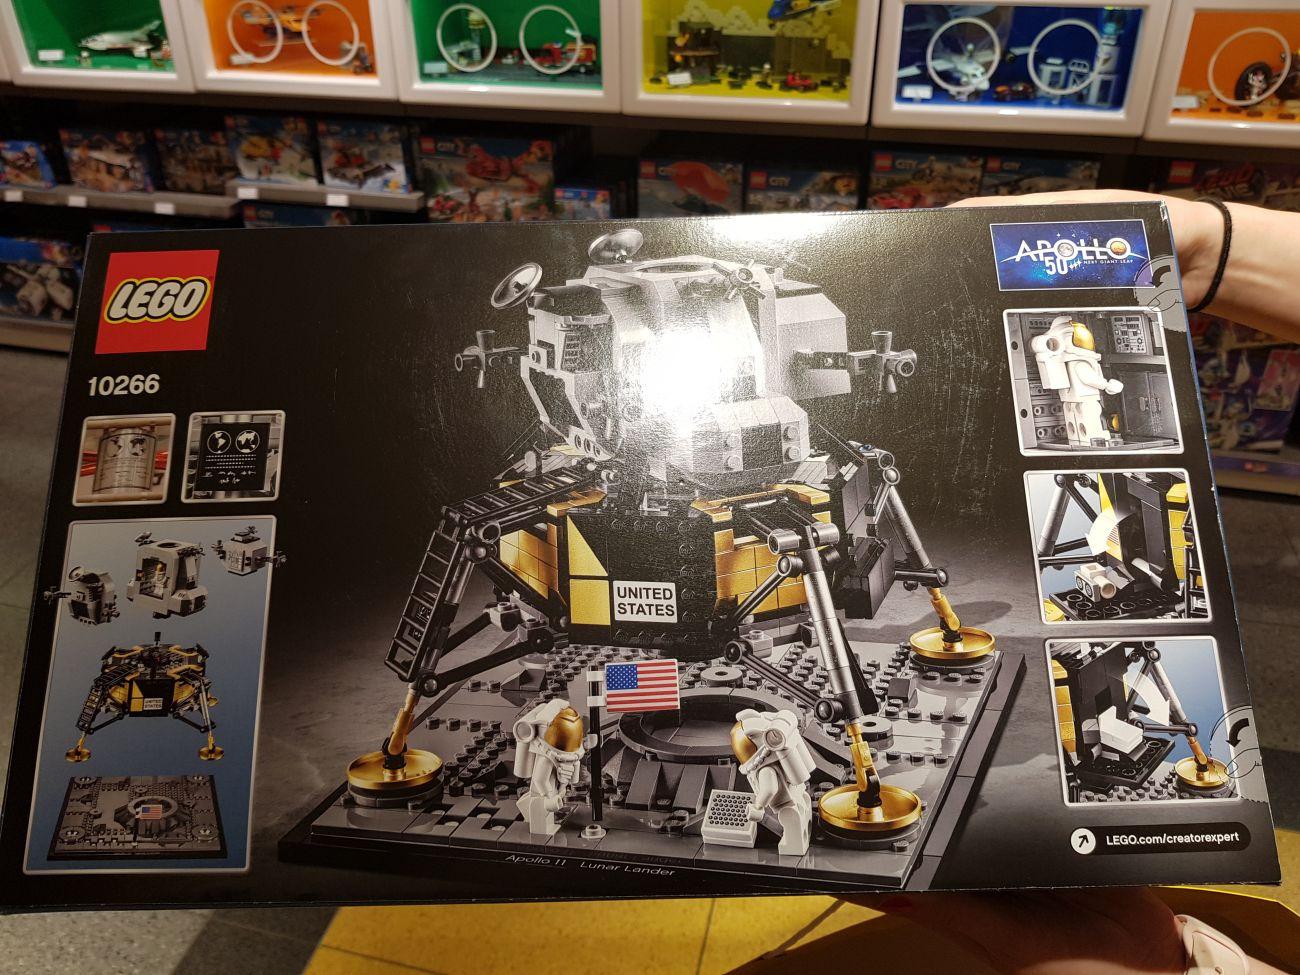 La foto della scatola del set LEGO Creator Expert 10266 NASA